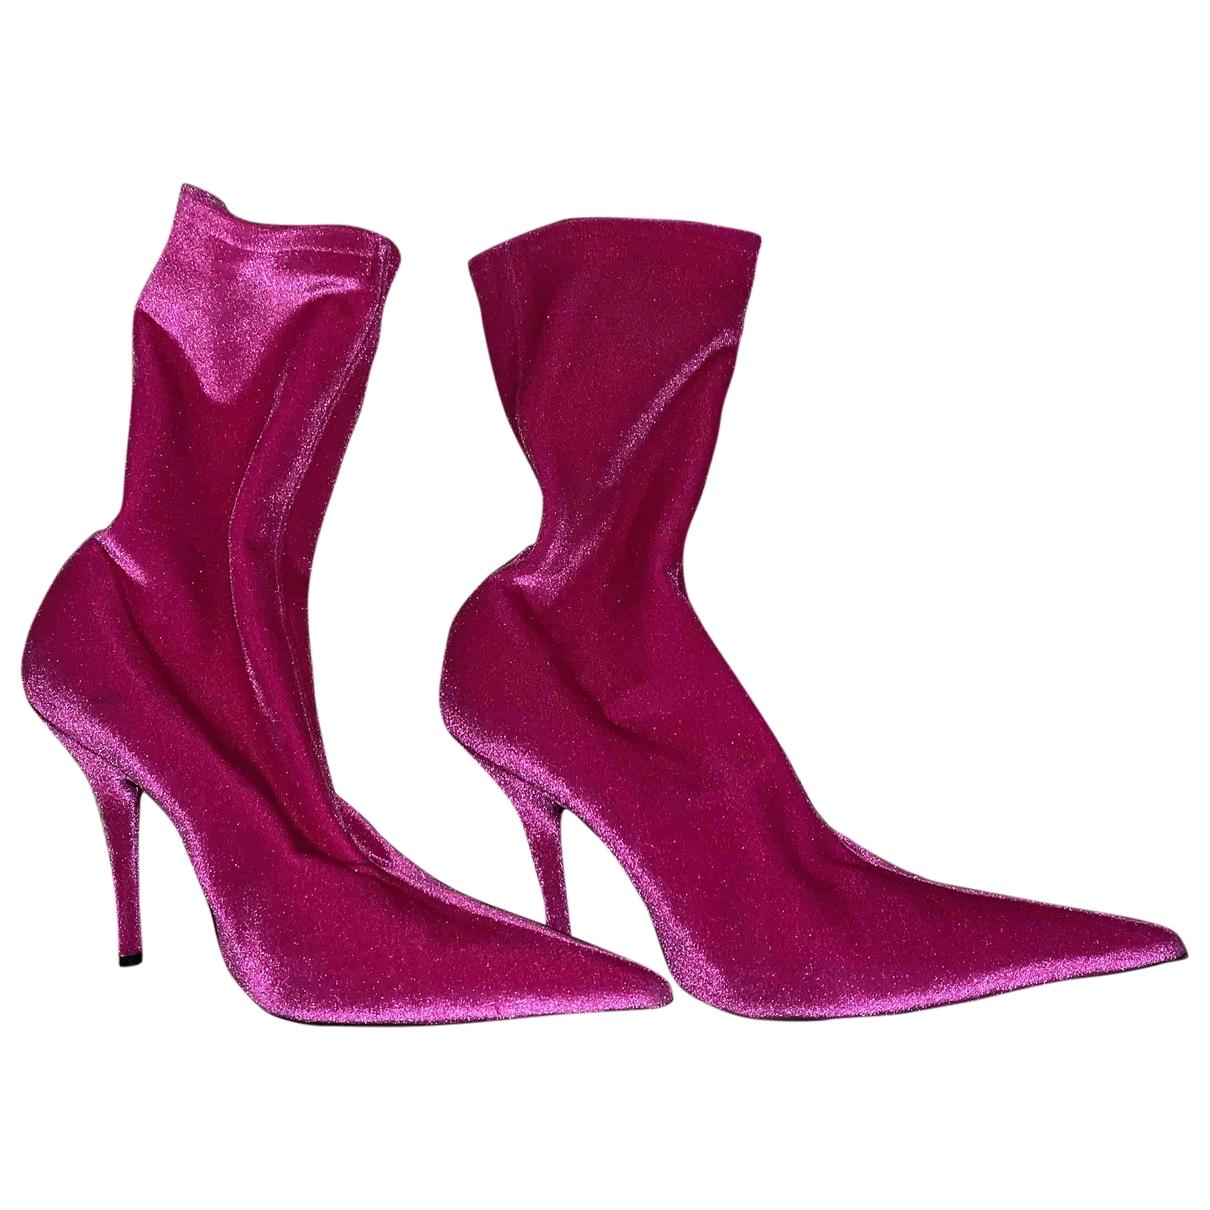 Balenciaga - Bottes Knife pour femme en toile - rose